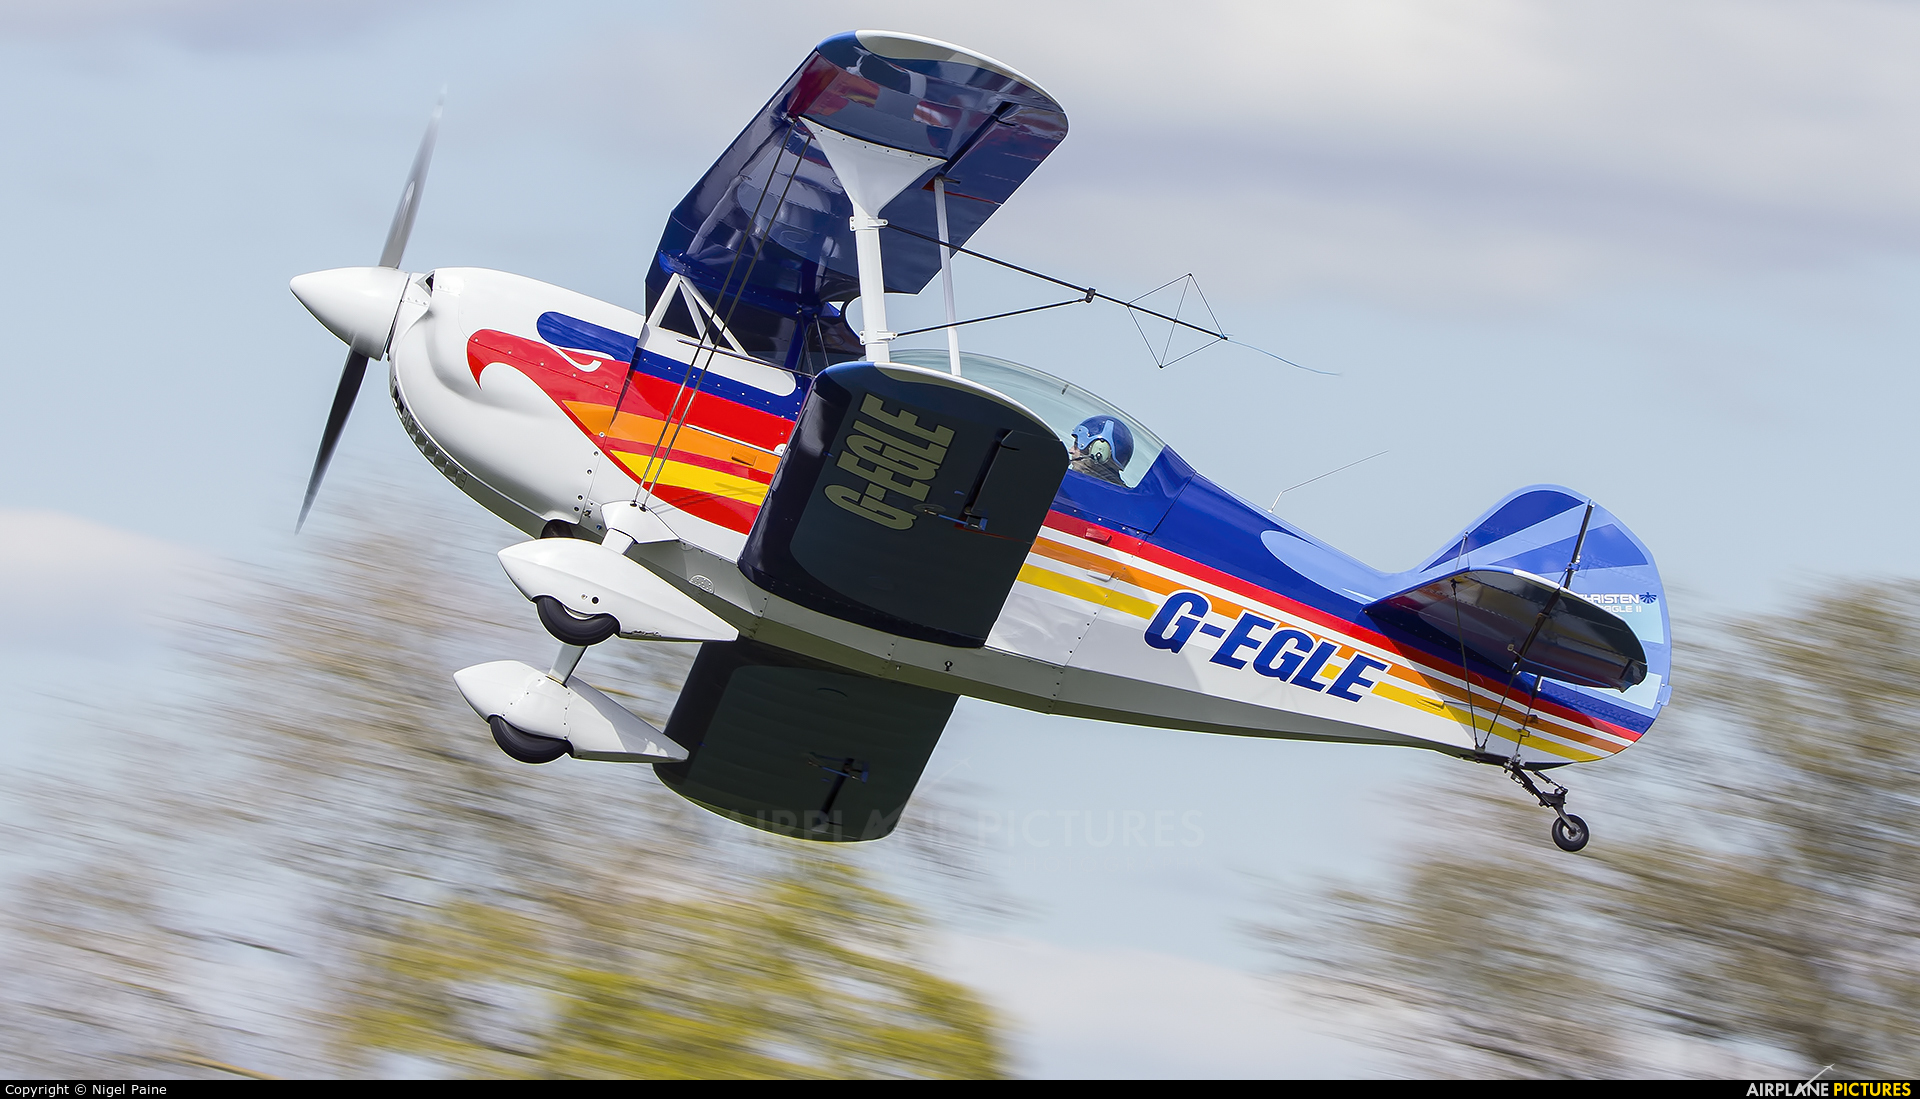 Private G-EGLE aircraft at Lashenden / Headcorn